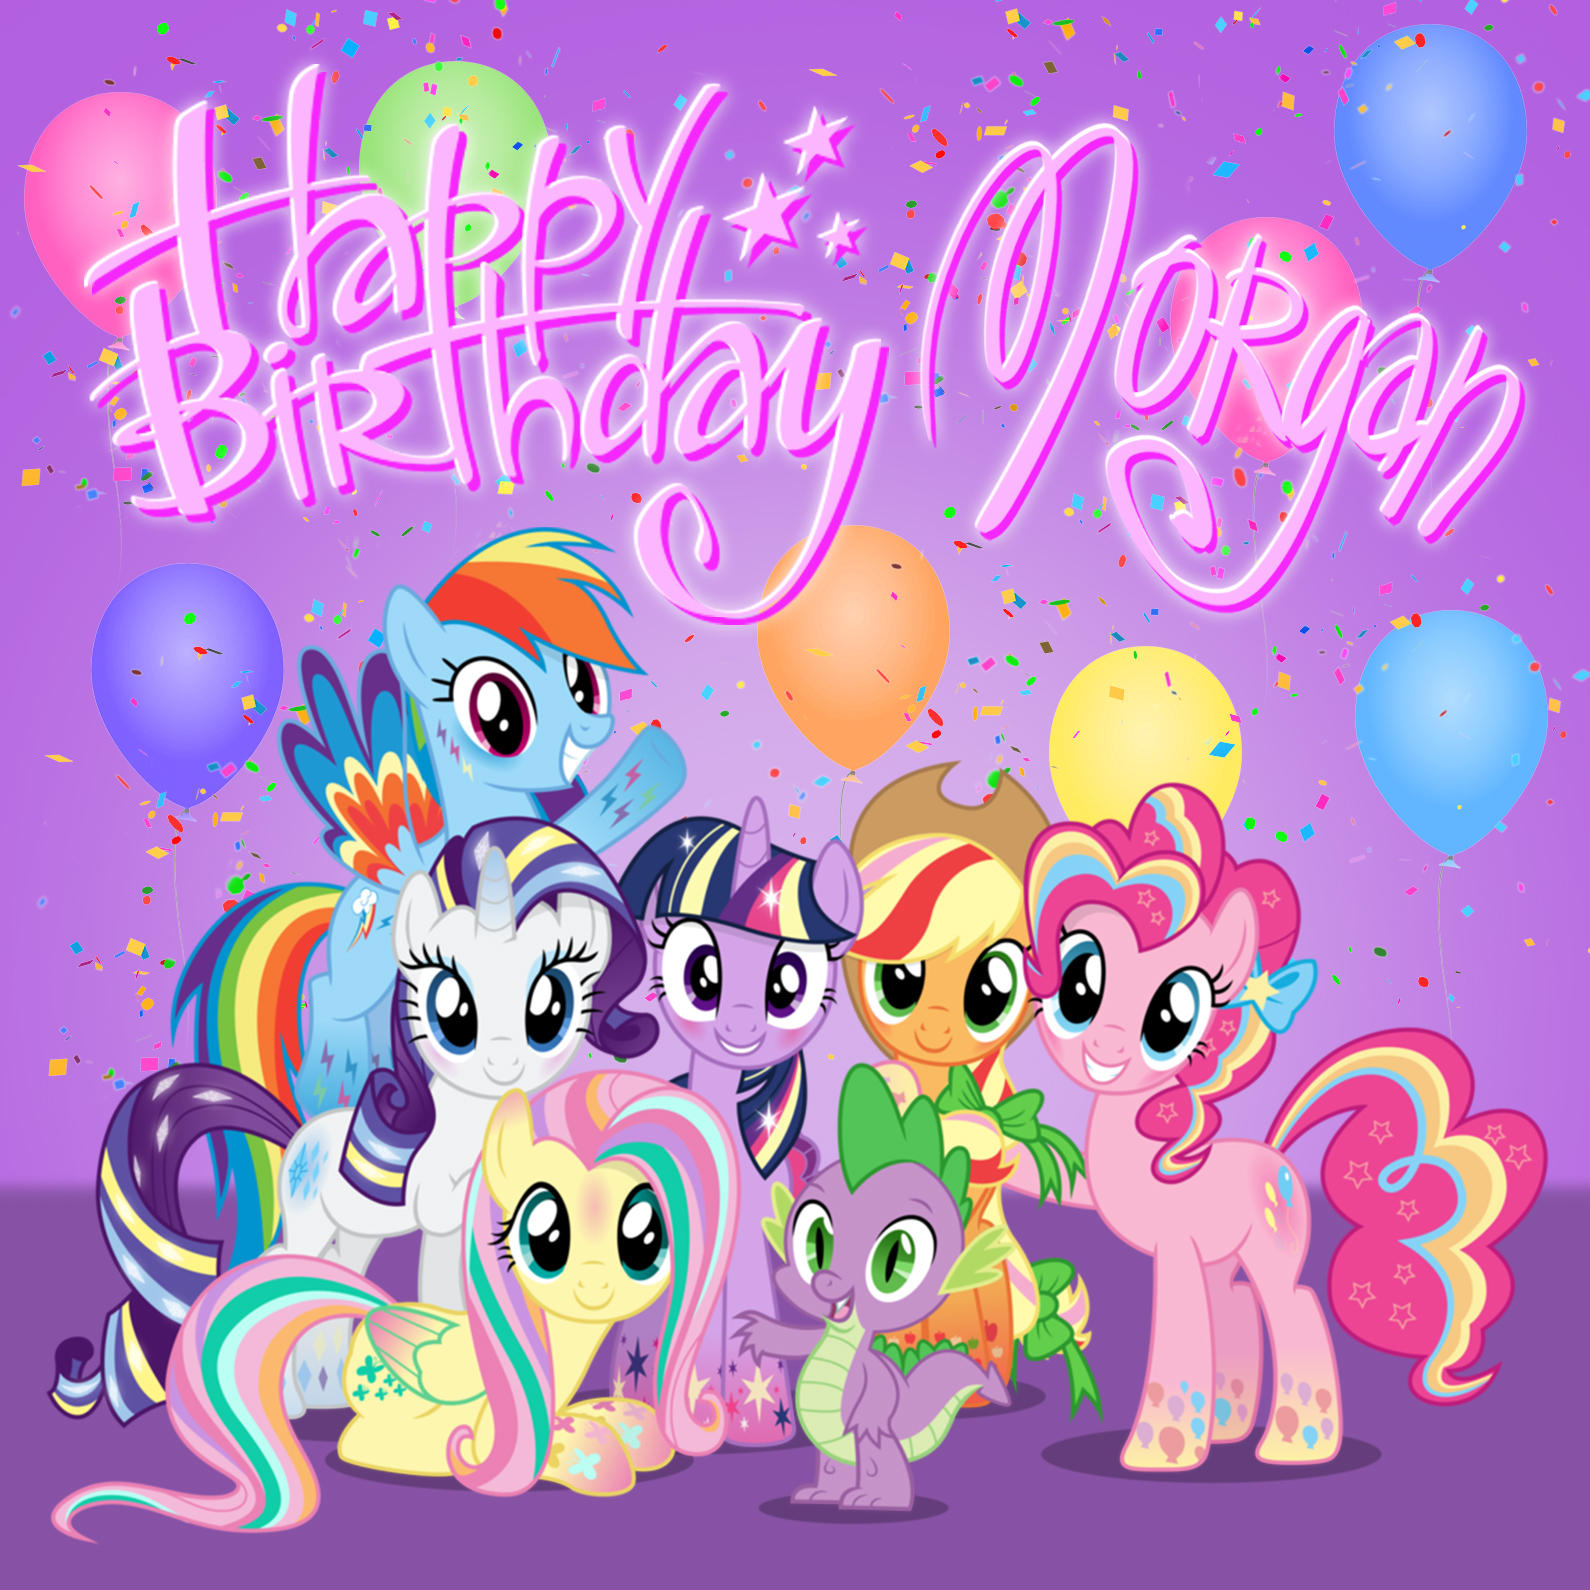 Morgan's birthday cake by mosuga